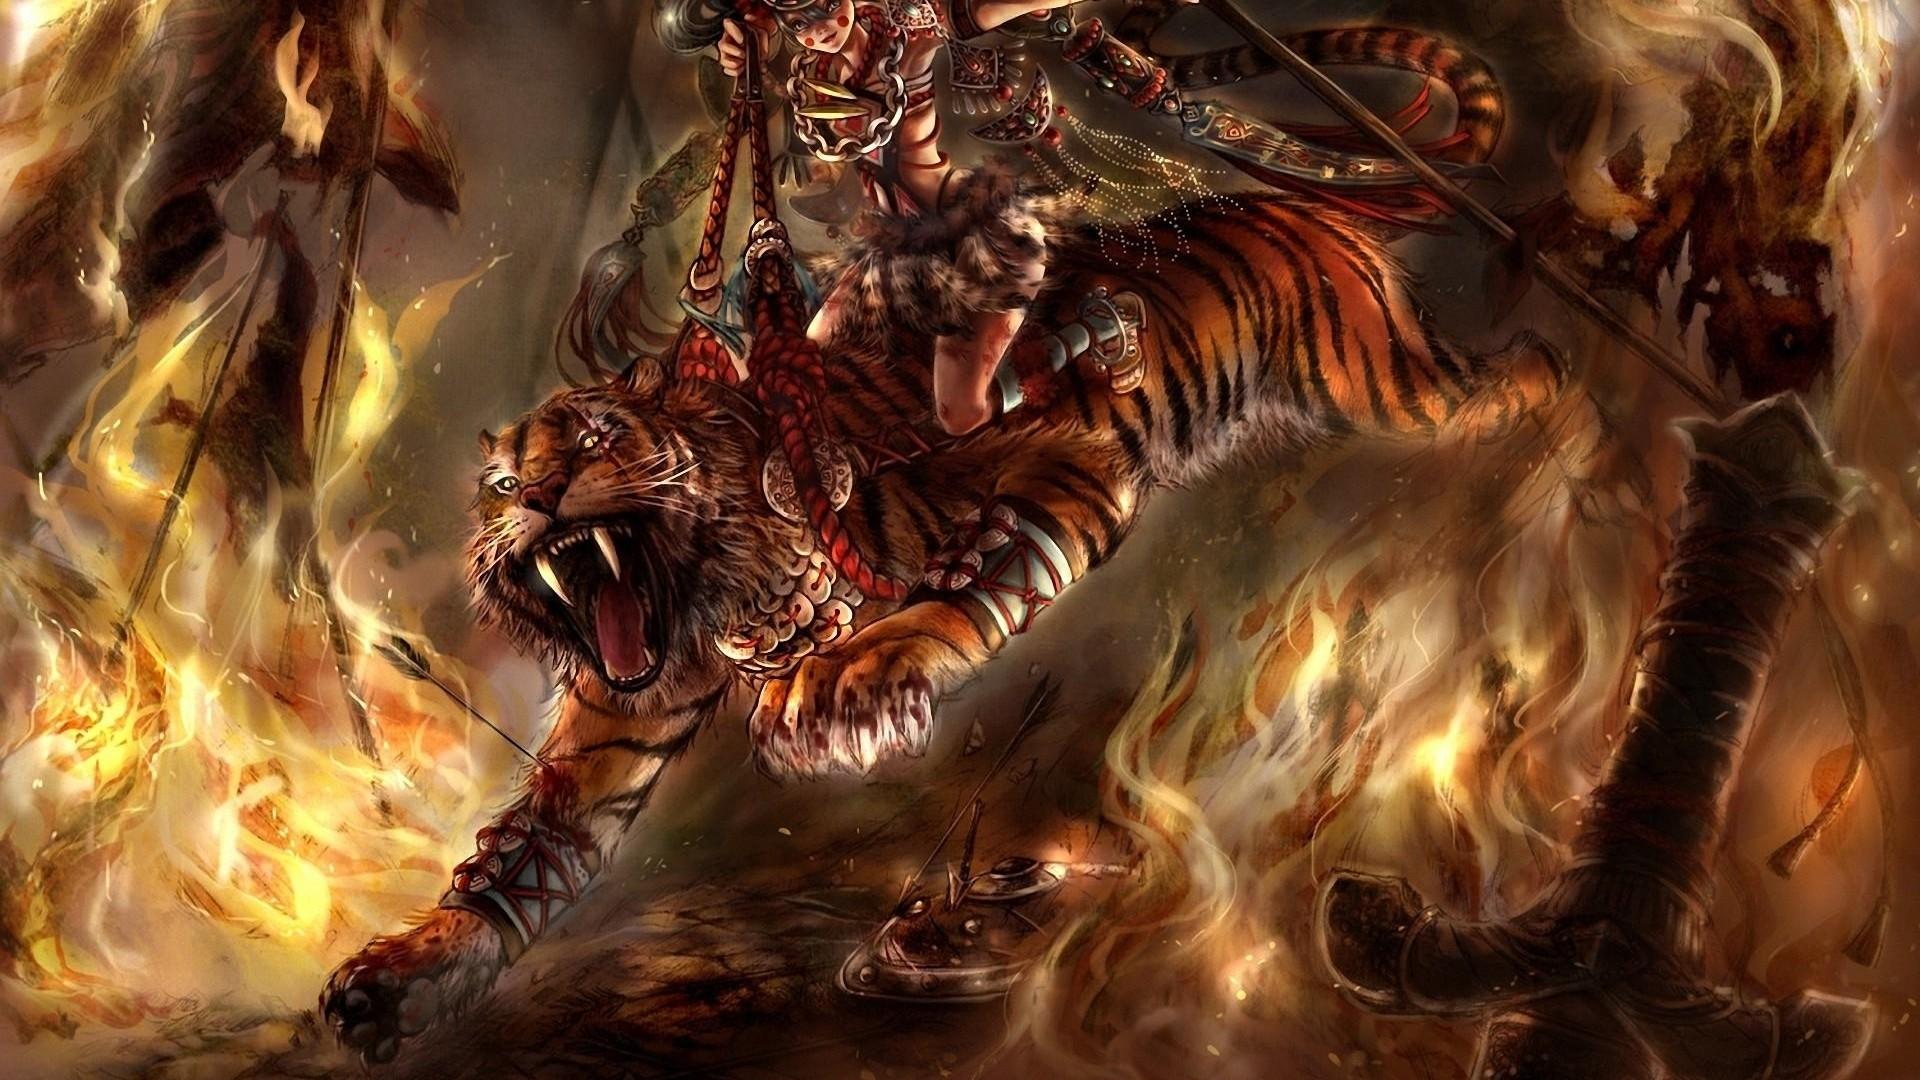 … Background Full HD 1080p. Wallpaper tiger, horsewoman, girl,  fire, jump